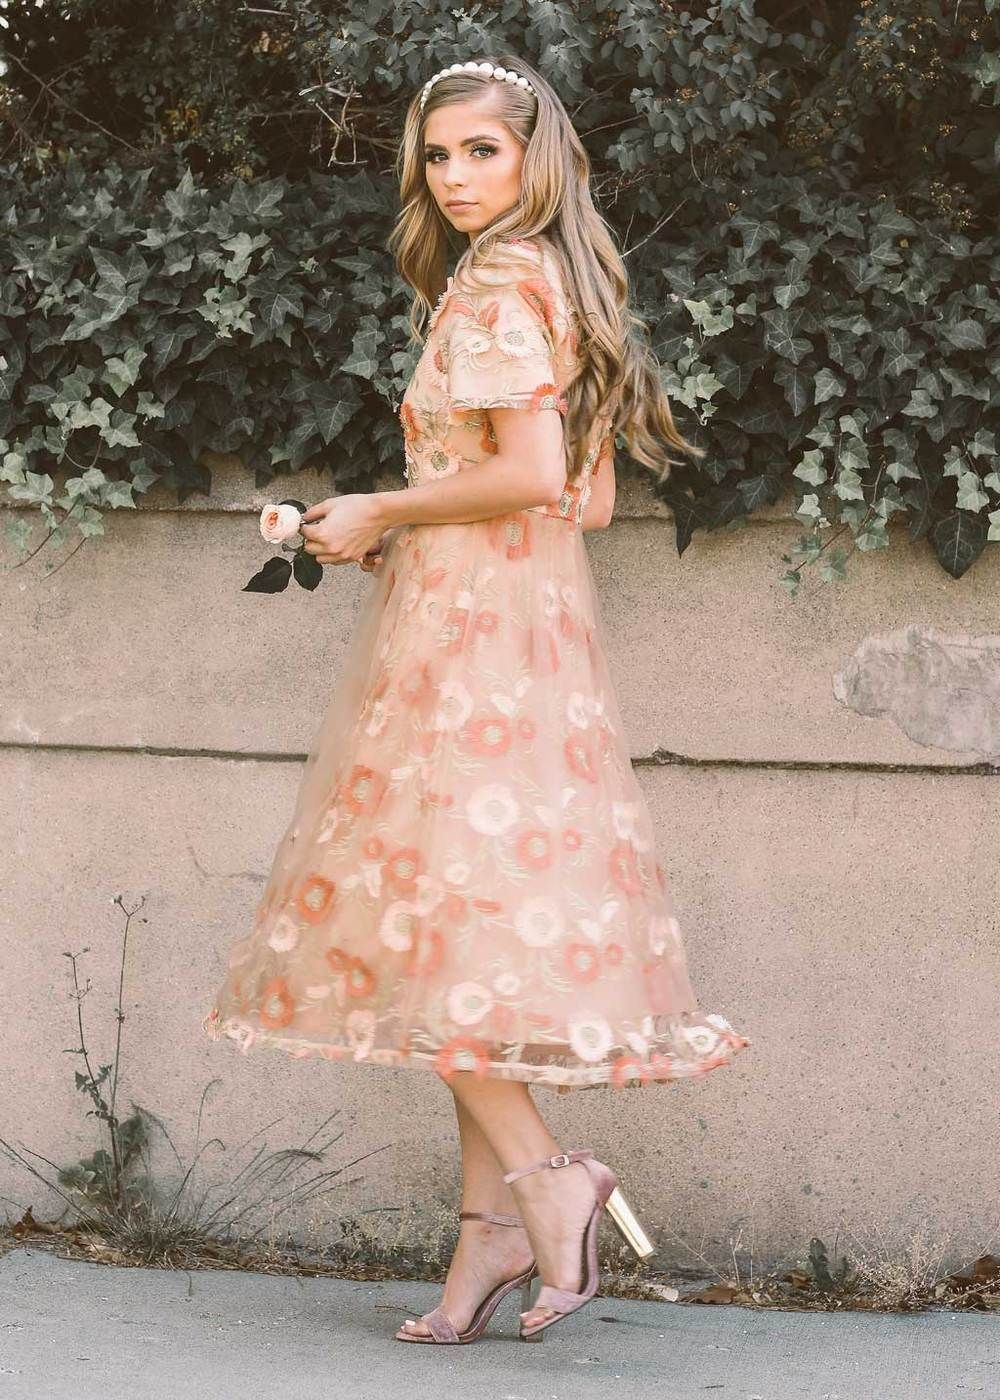 Royal Renoir Floral Dress Jessakae Modest Fashion Womens Fashion Easter Dress Bridesmaid Dress Flowers Wa Dresses Easter Dresses For Women Floral Dress [ 1400 x 1000 Pixel ]